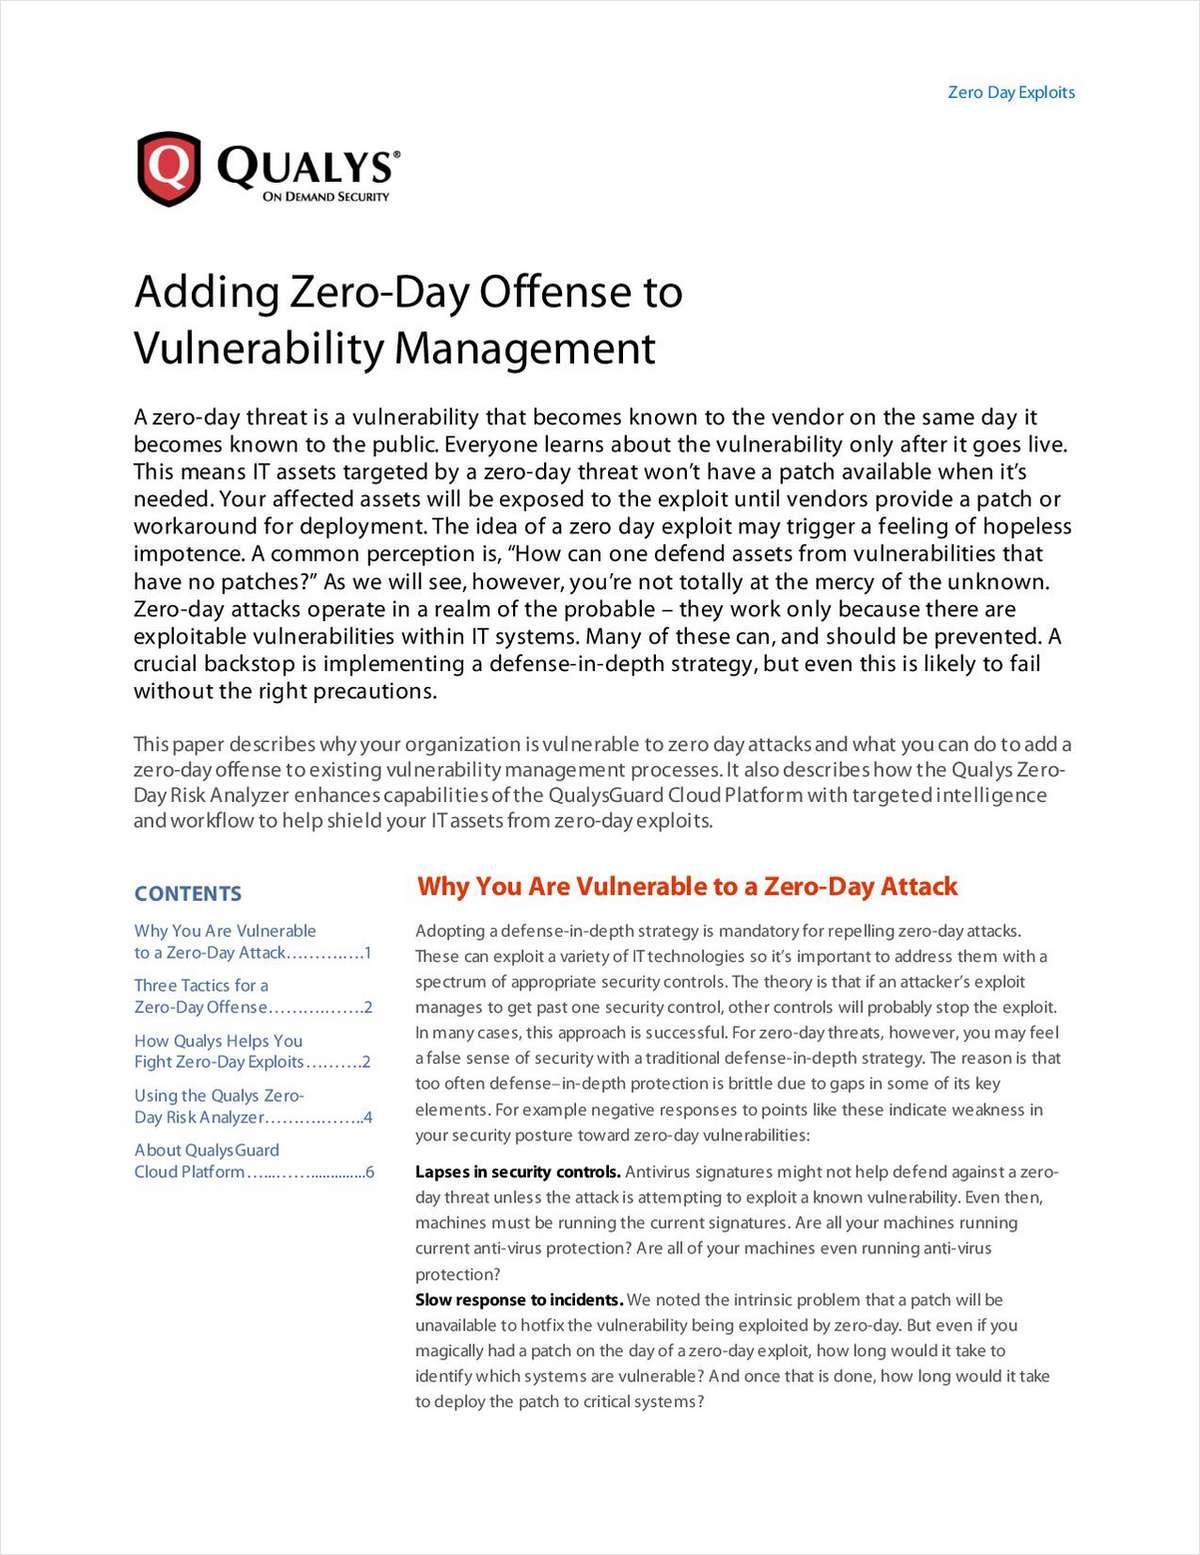 Adding Zero-Day Offense to Vulnerability Management